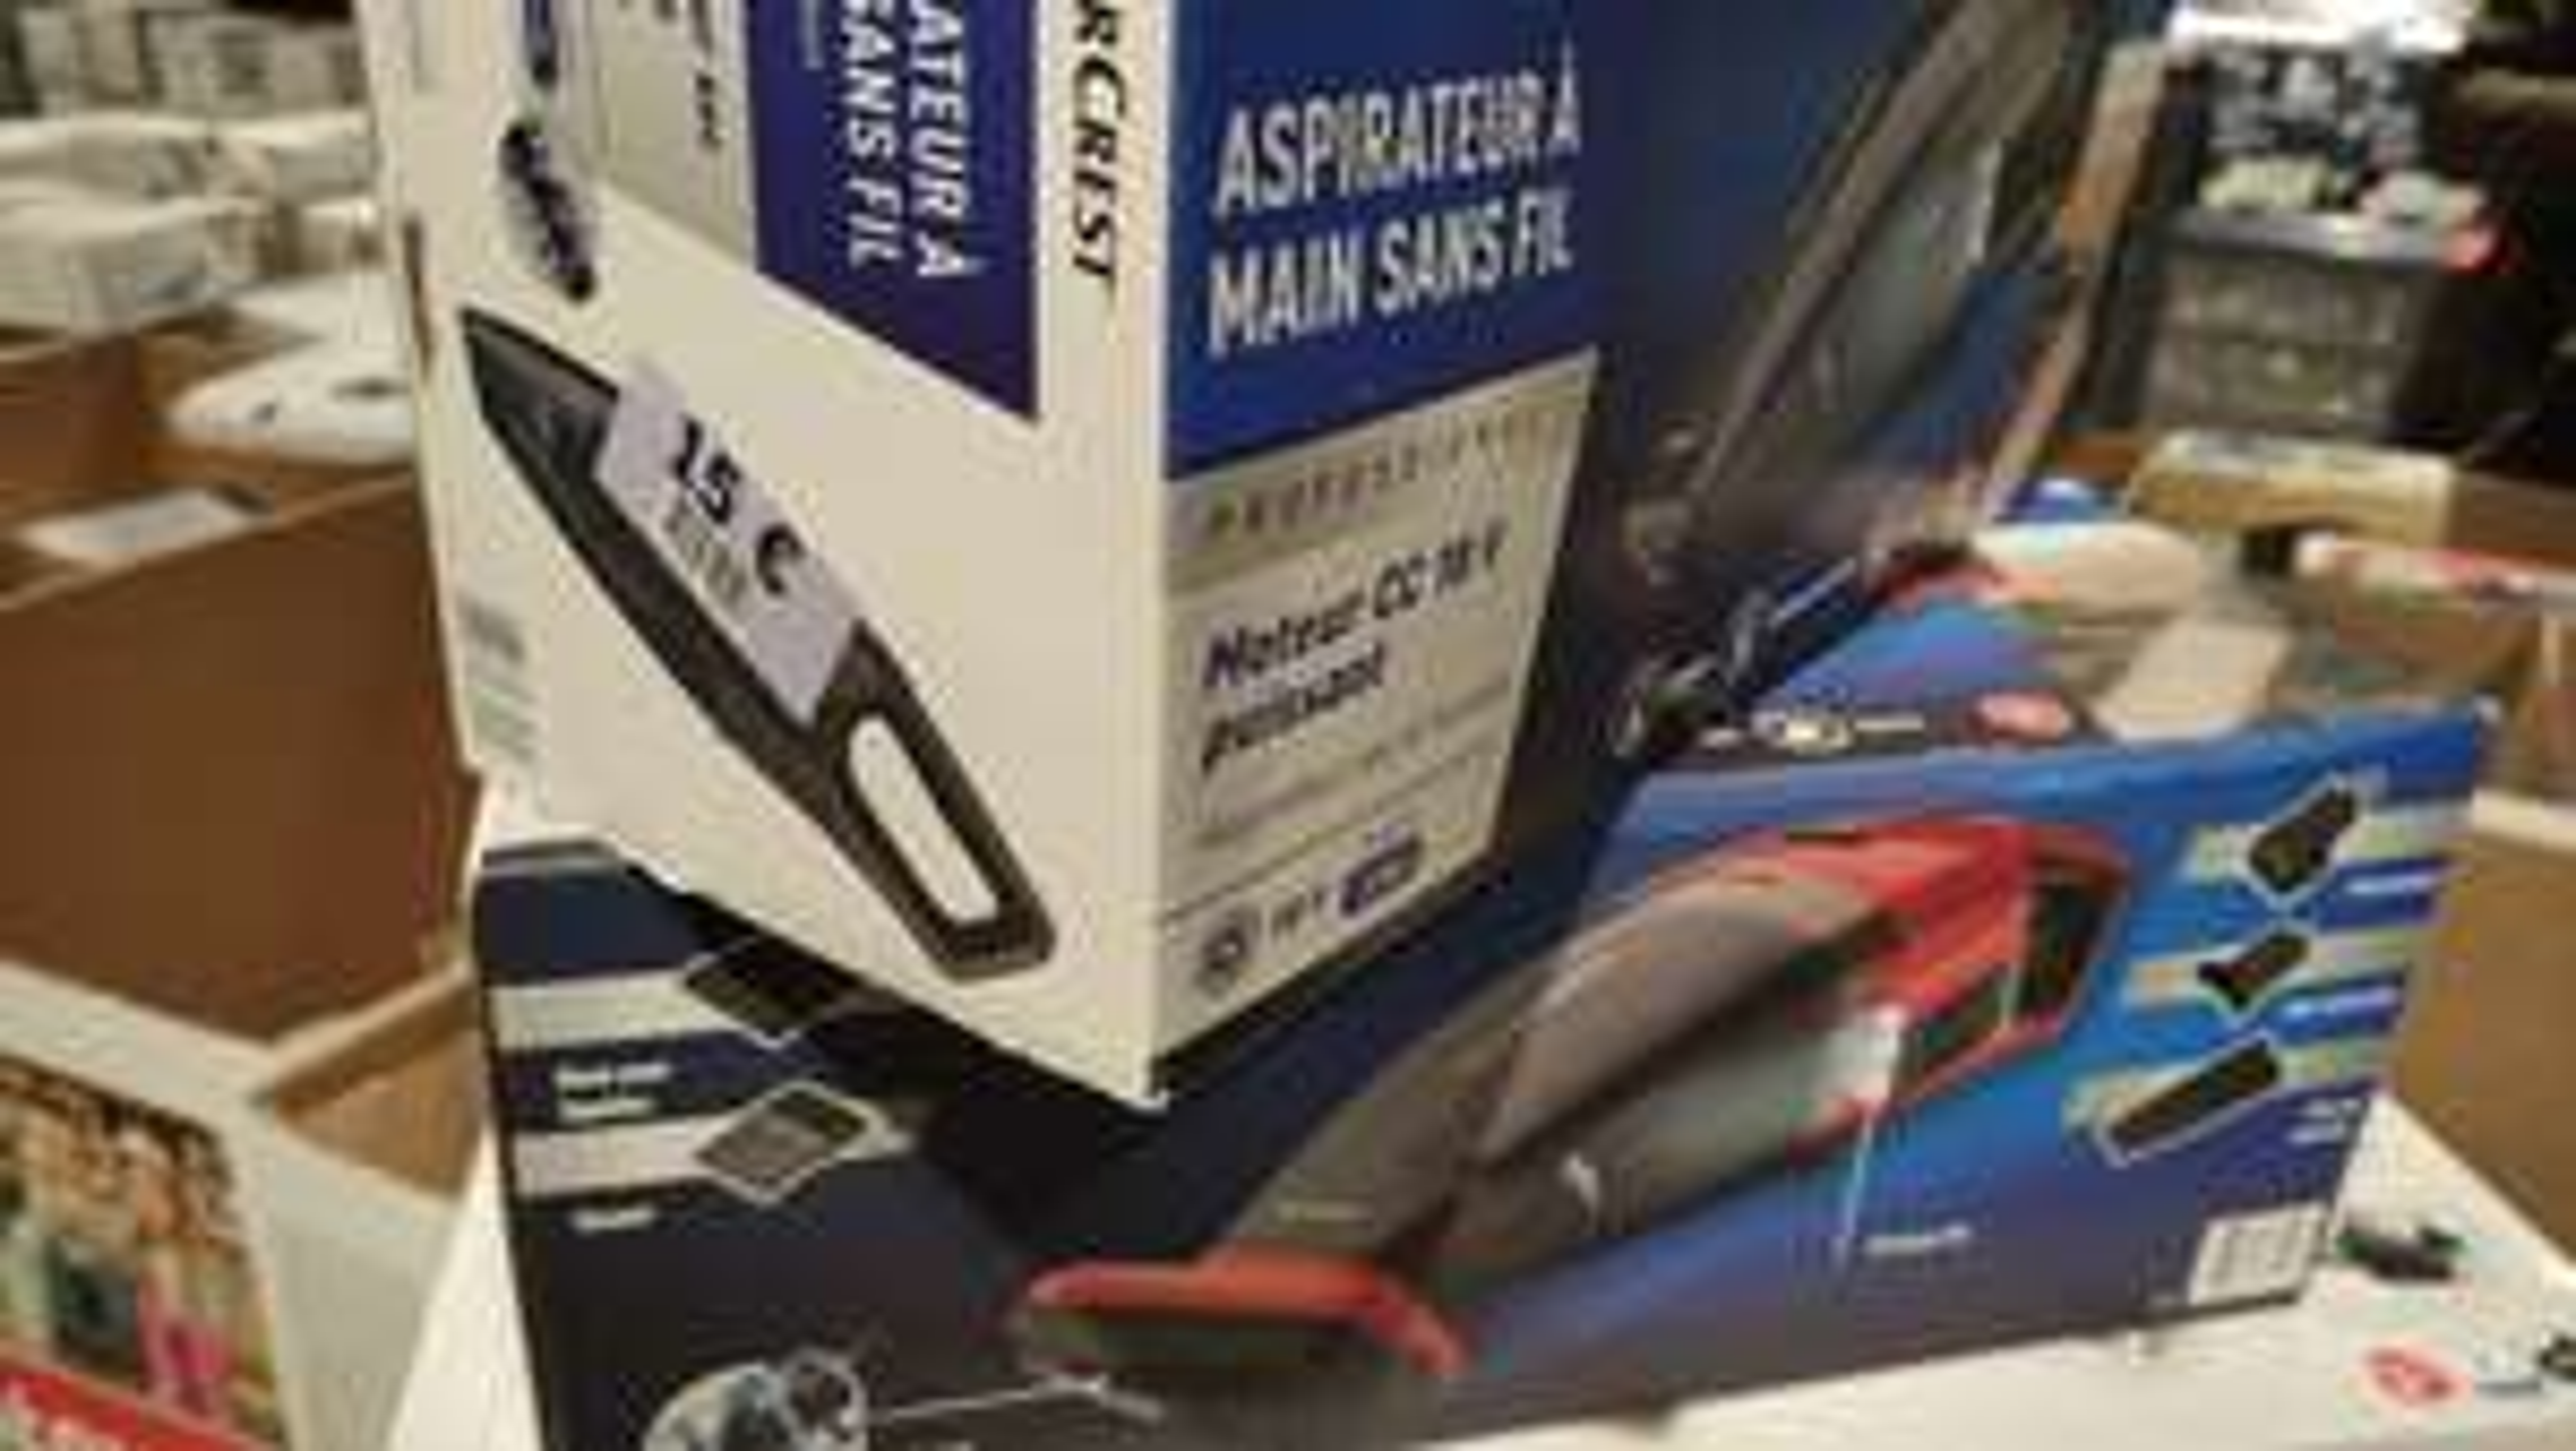 Aspirateur à main Silvercrest (18V) - Forbach (57)